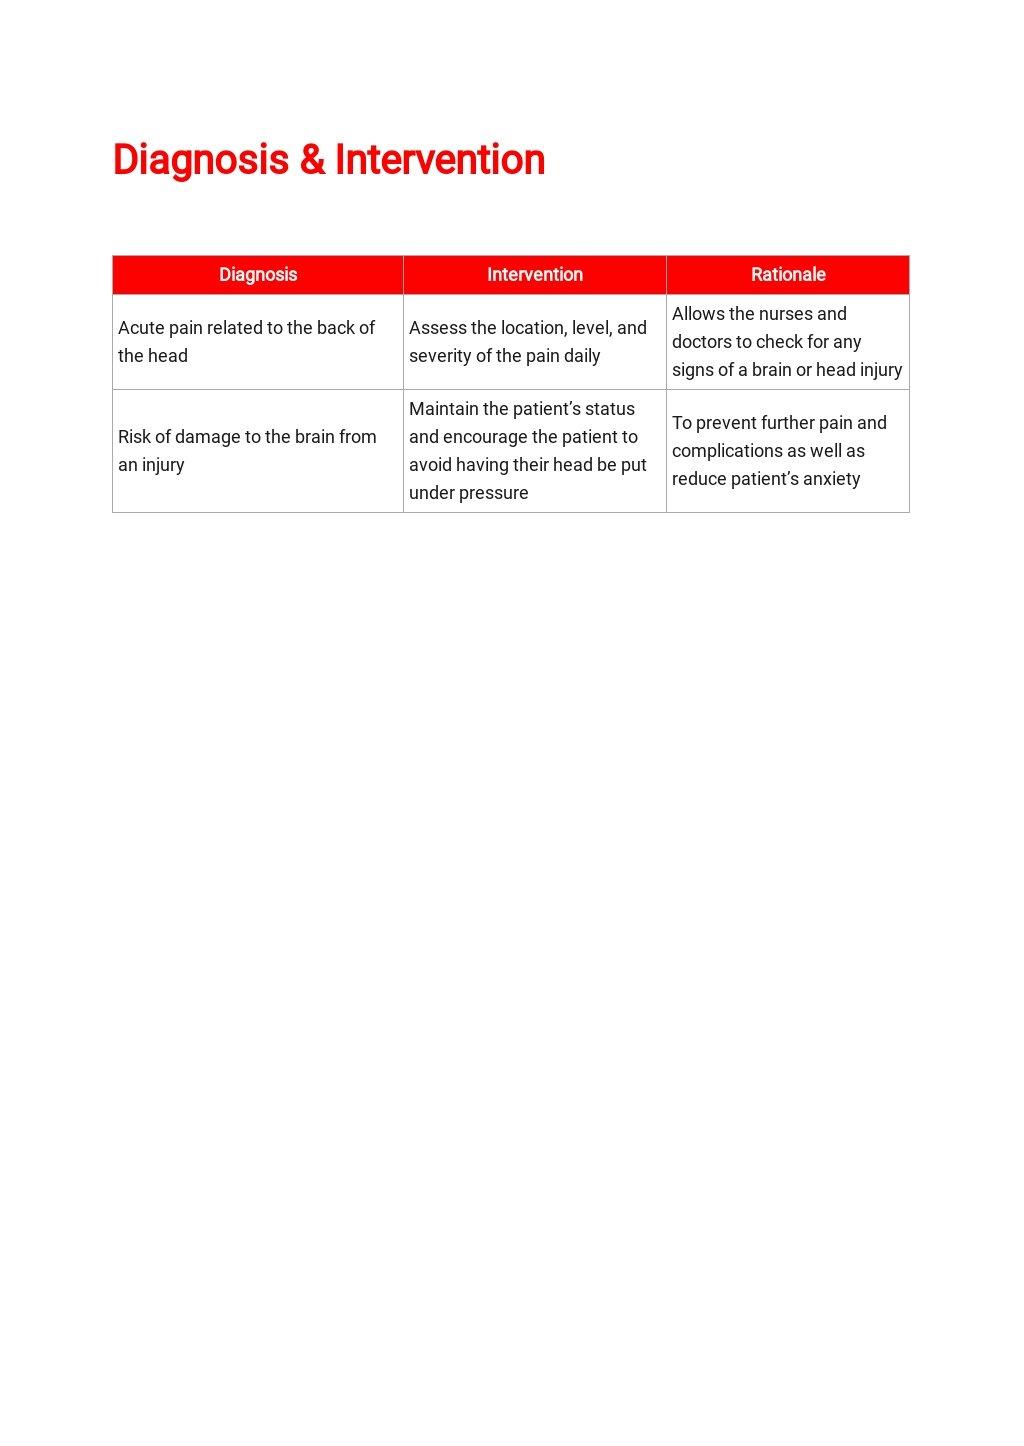 Nursing Student Care Plan Template [Free PDF] - Google Docs, Word, Apple Pages, PDF